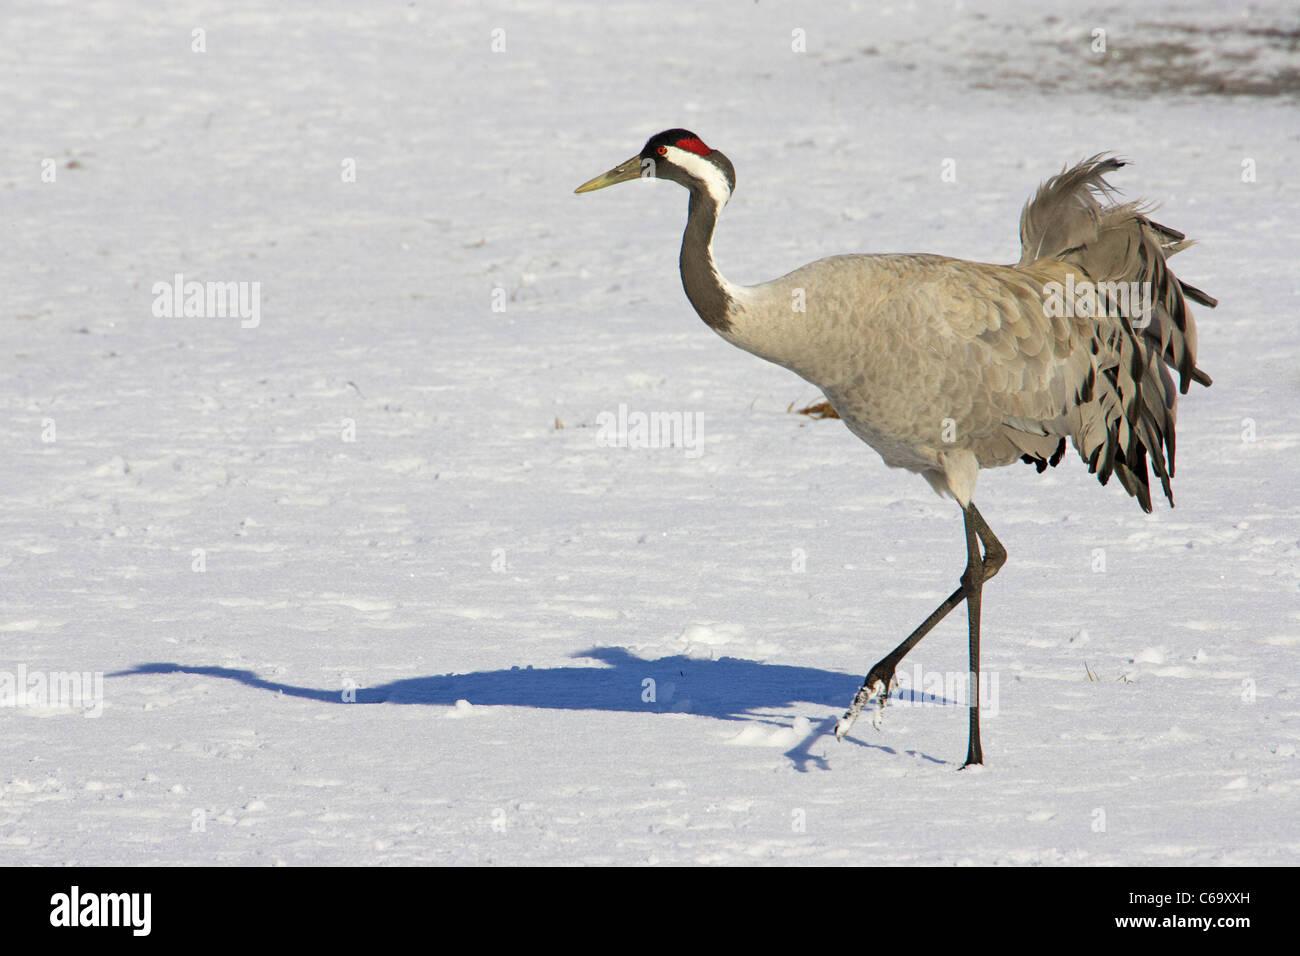 Common Crane, Eurasian Crane (Grus grus), adult walking on snow. - Stock Image